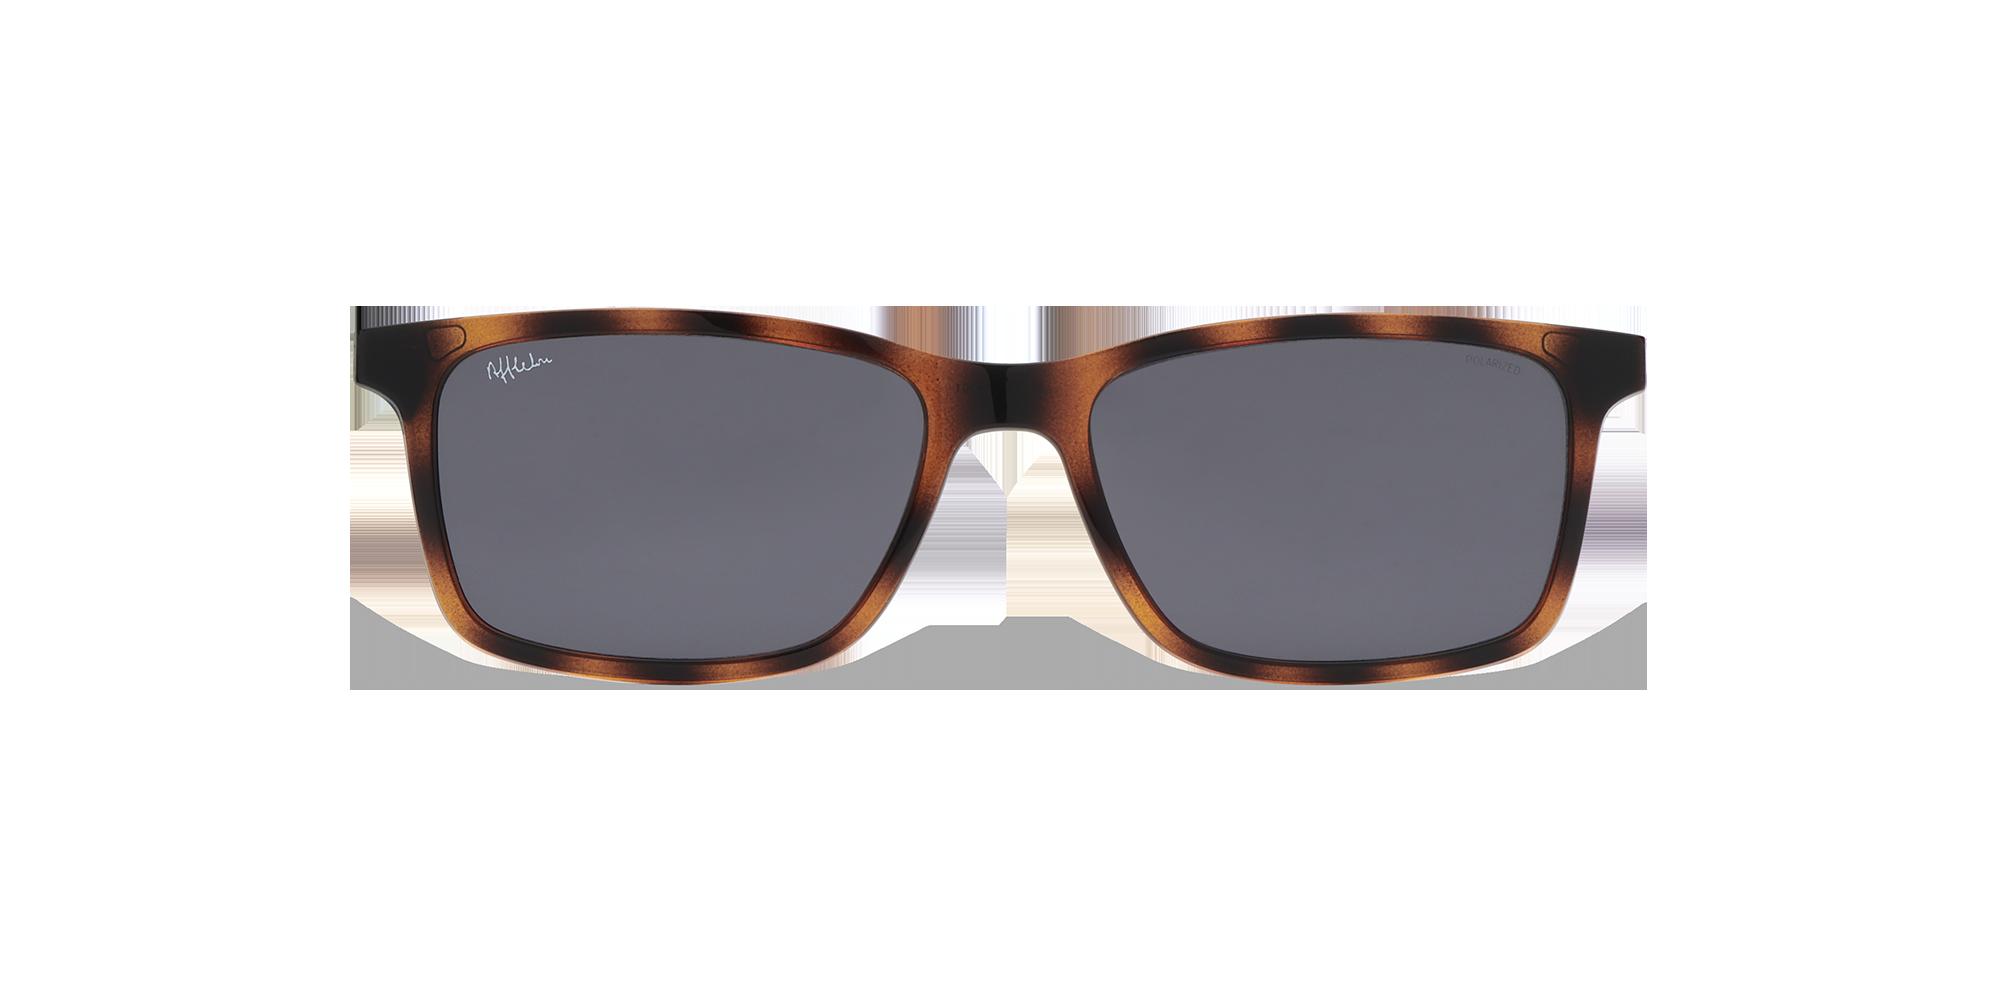 afflelou/france/products/smart_clip/clips_glasses/TMK32POTO015316.png